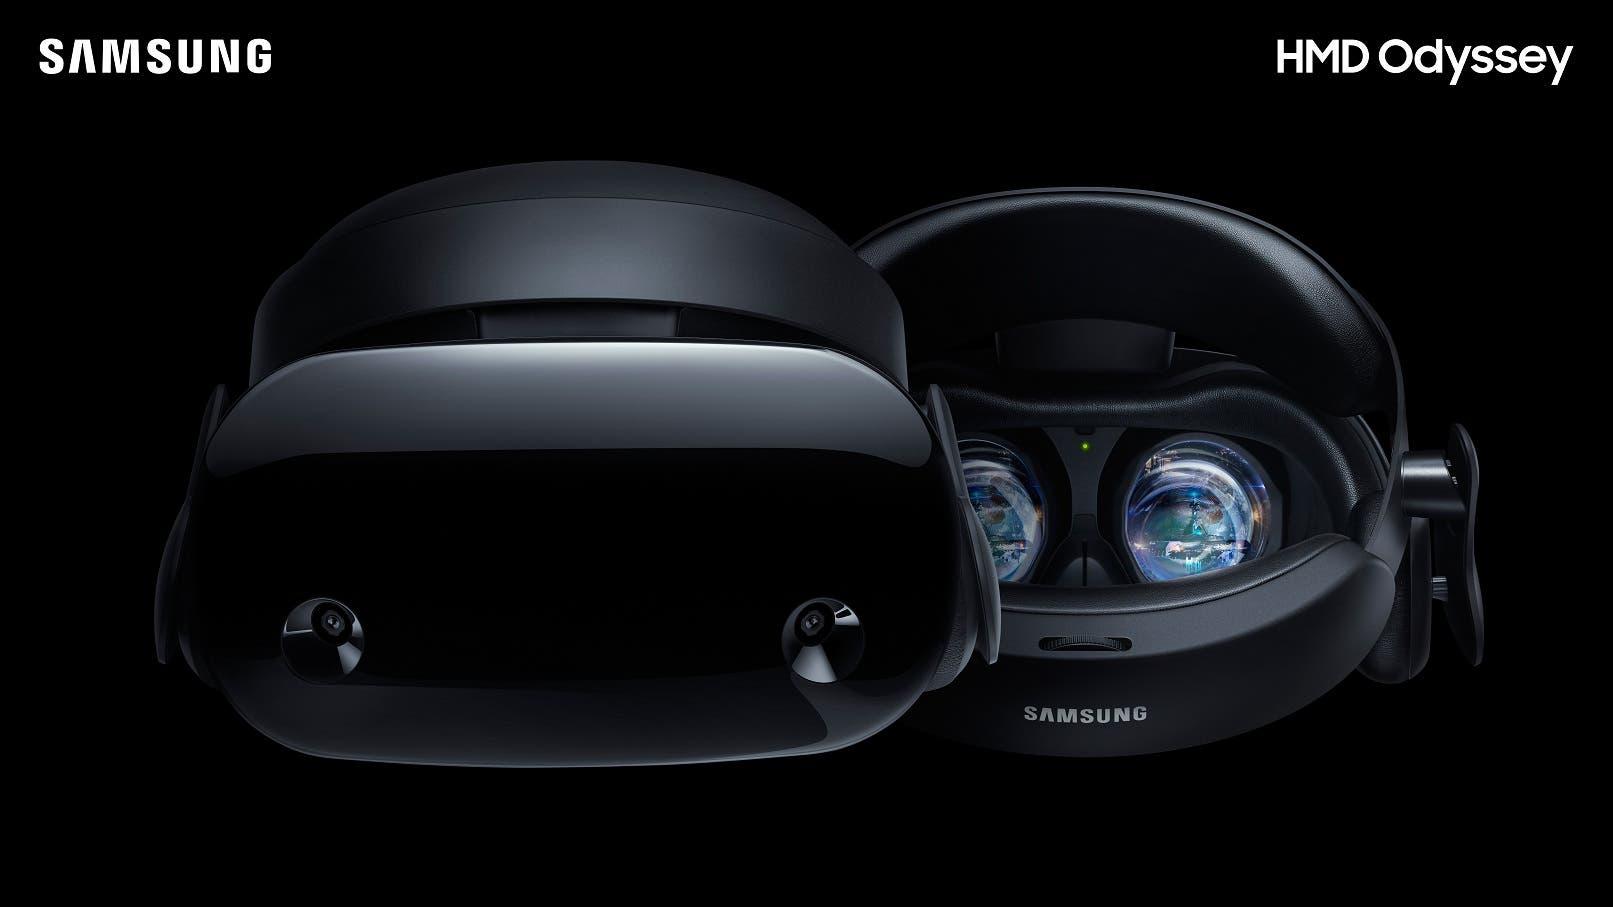 Samsung HMD Odyssey Windows Mixed Reality